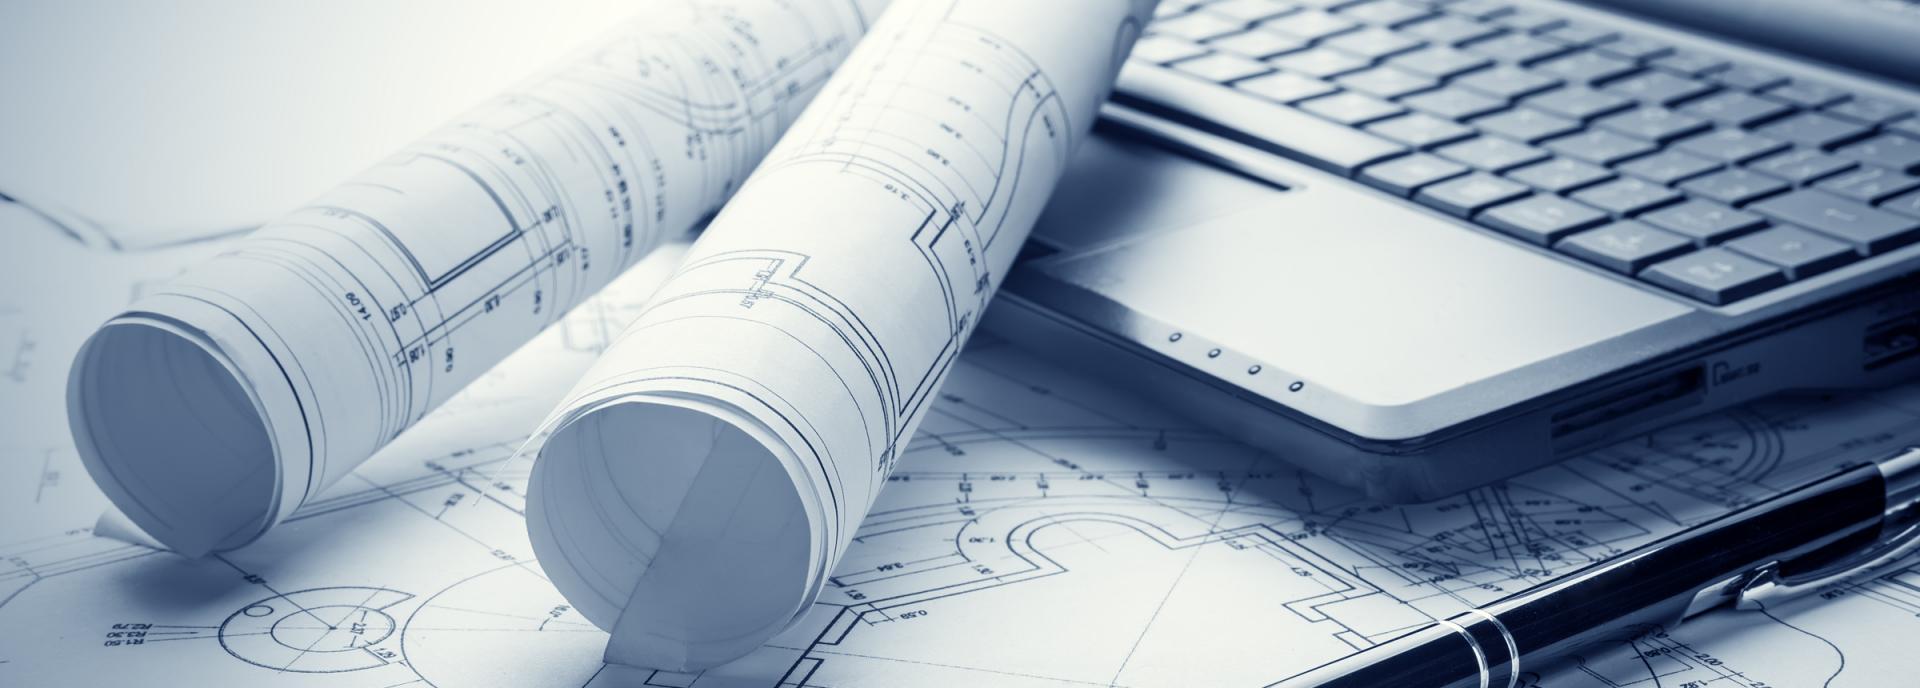 Engineering & Architectural Resources | Rinnai America